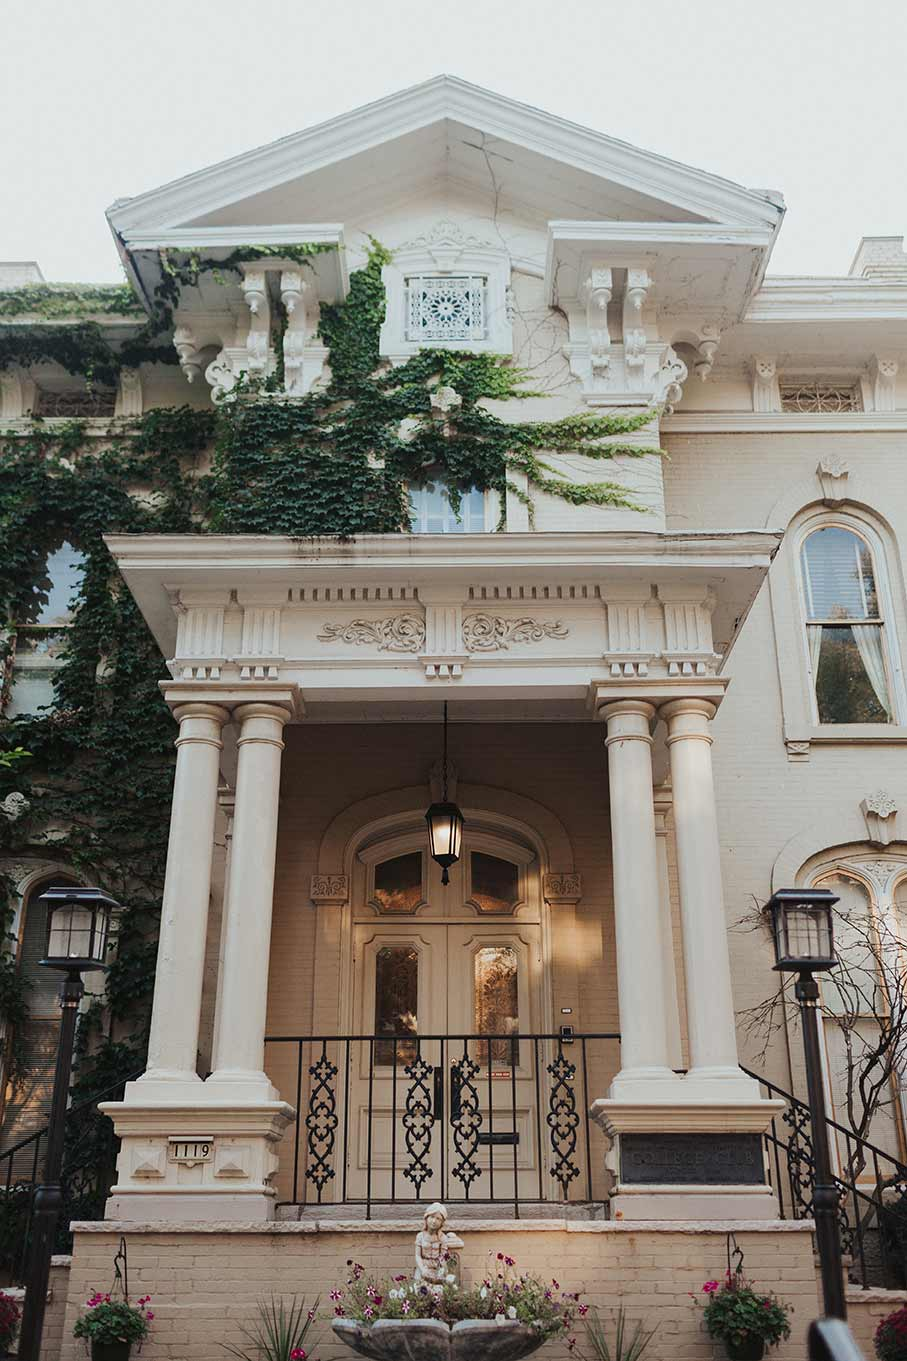 villa-filomena-milwaukee-historic-mansion-exterior-004.jpg